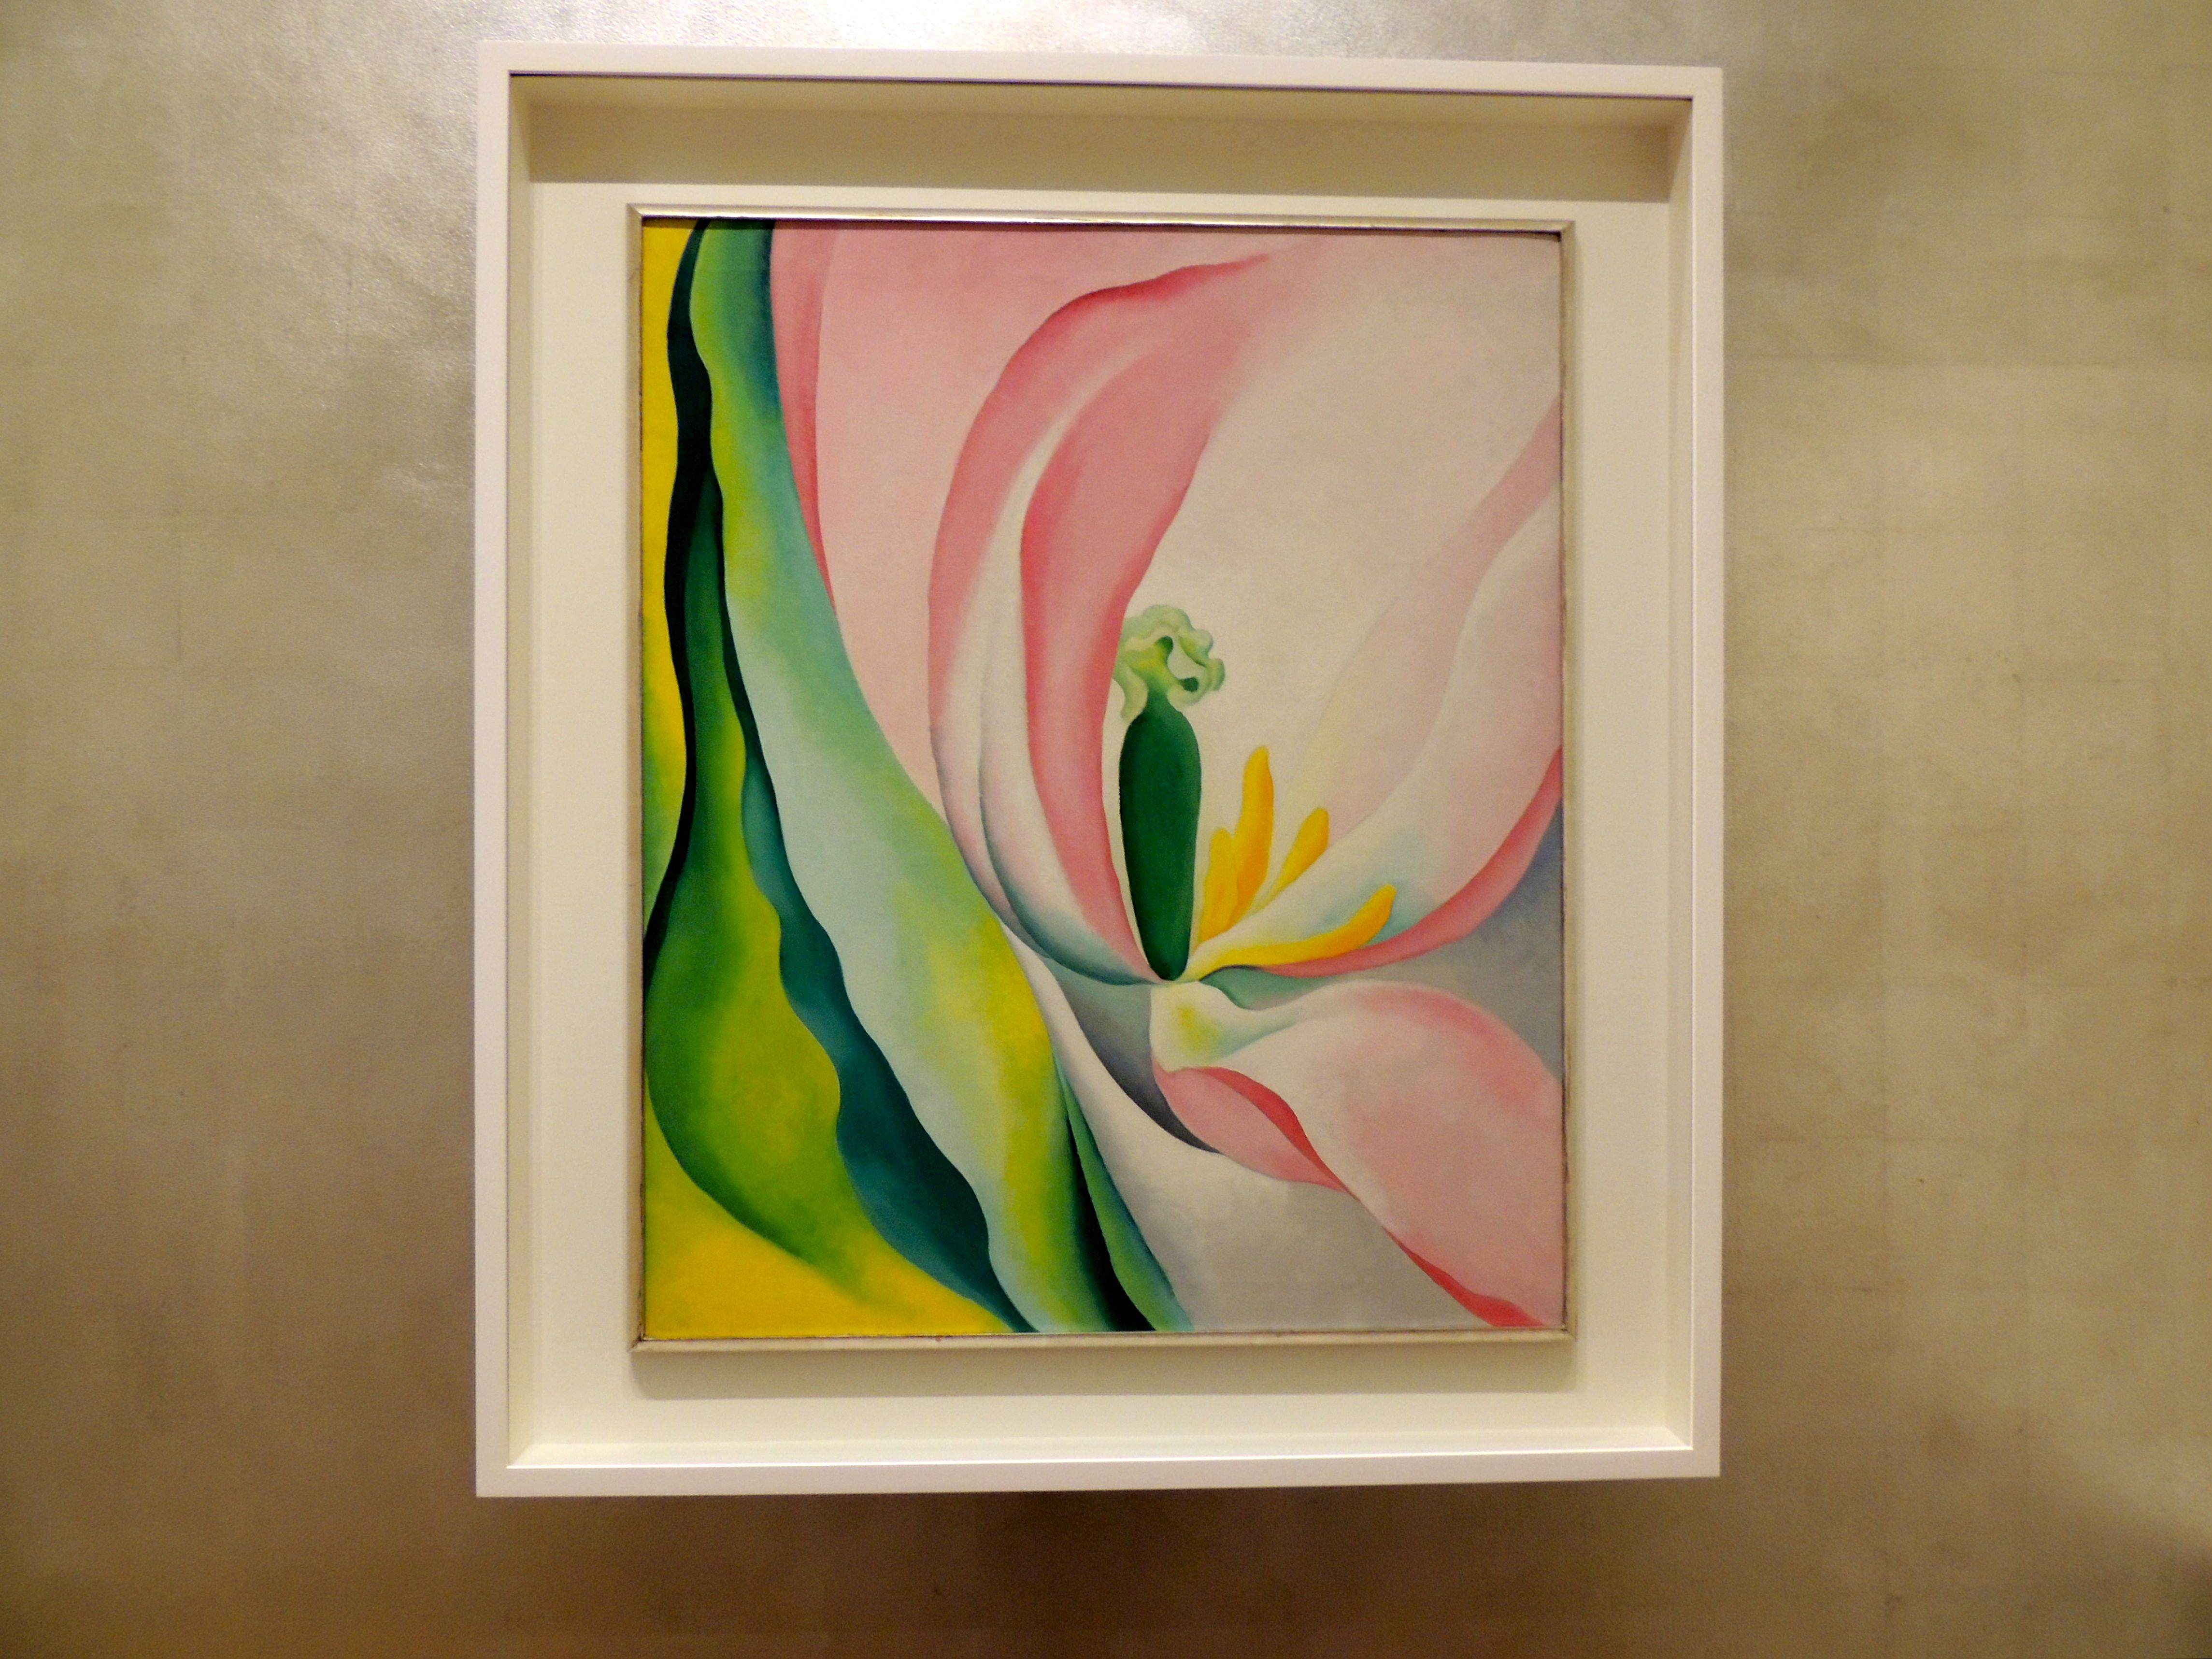 Pink Tulip by Georgia O'Keefe